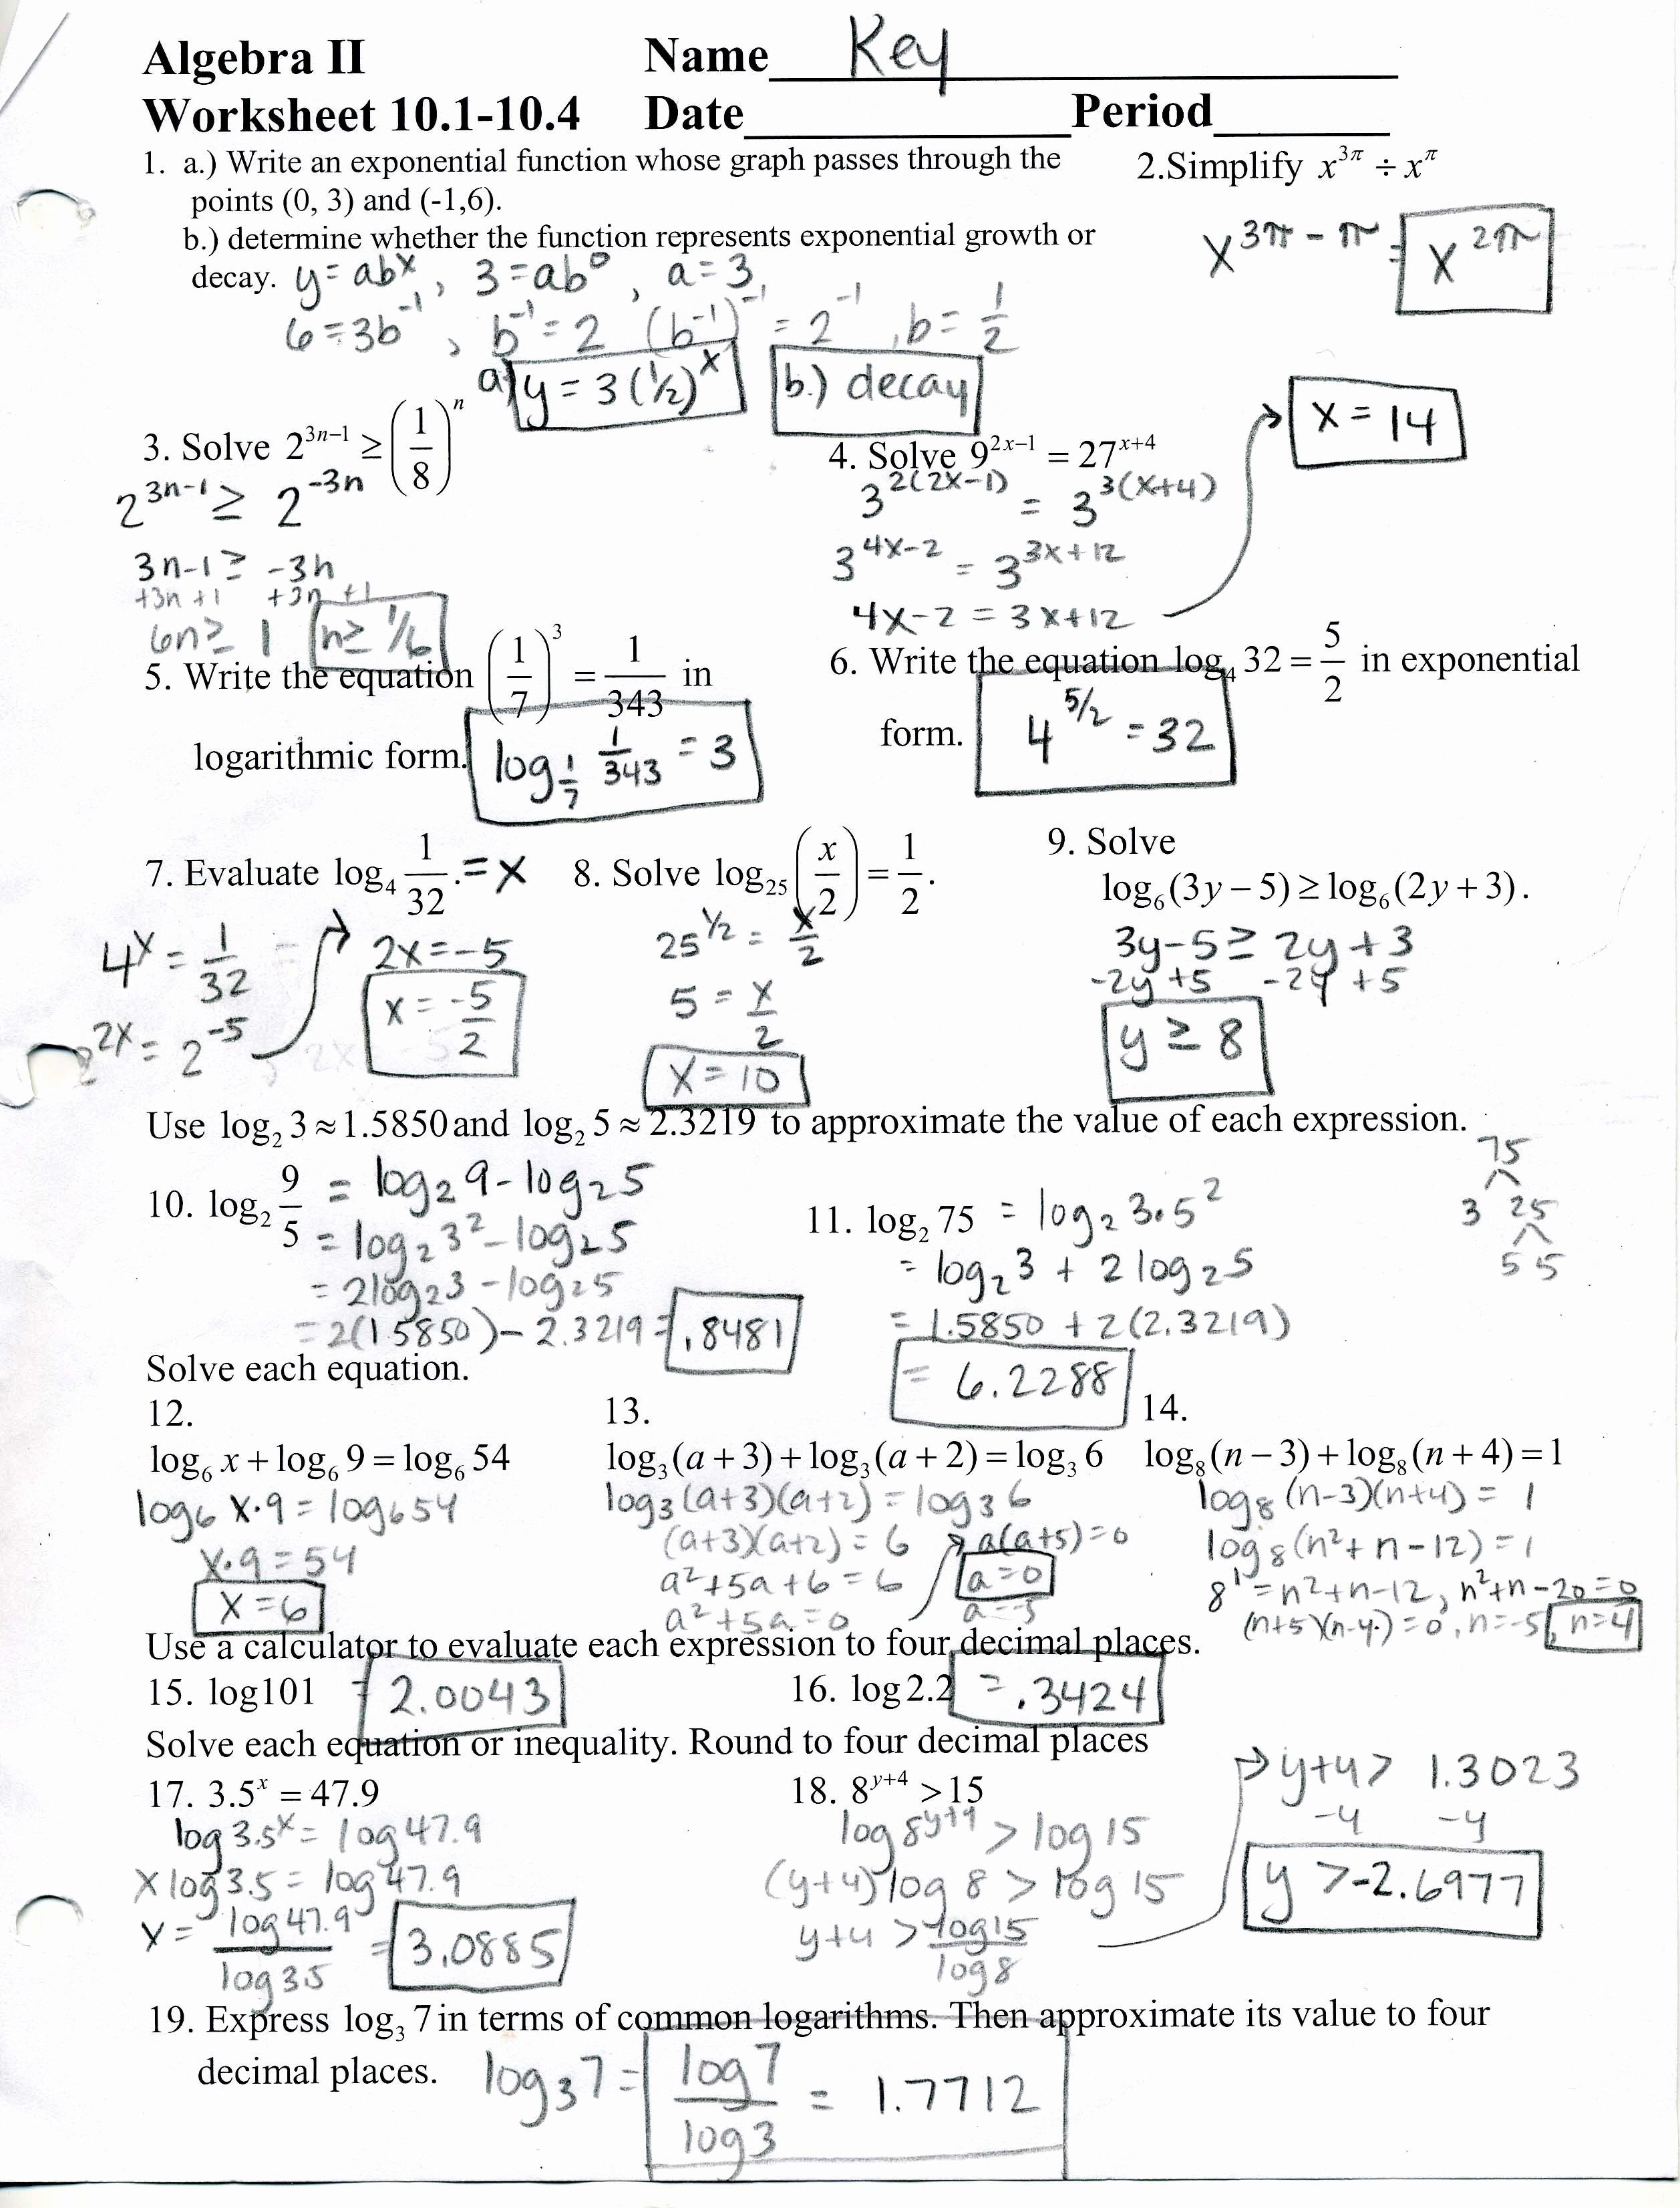 Algebra 2 Worksheet Pdf Fresh Mrscabral Algebra 2 Worksheet Answers